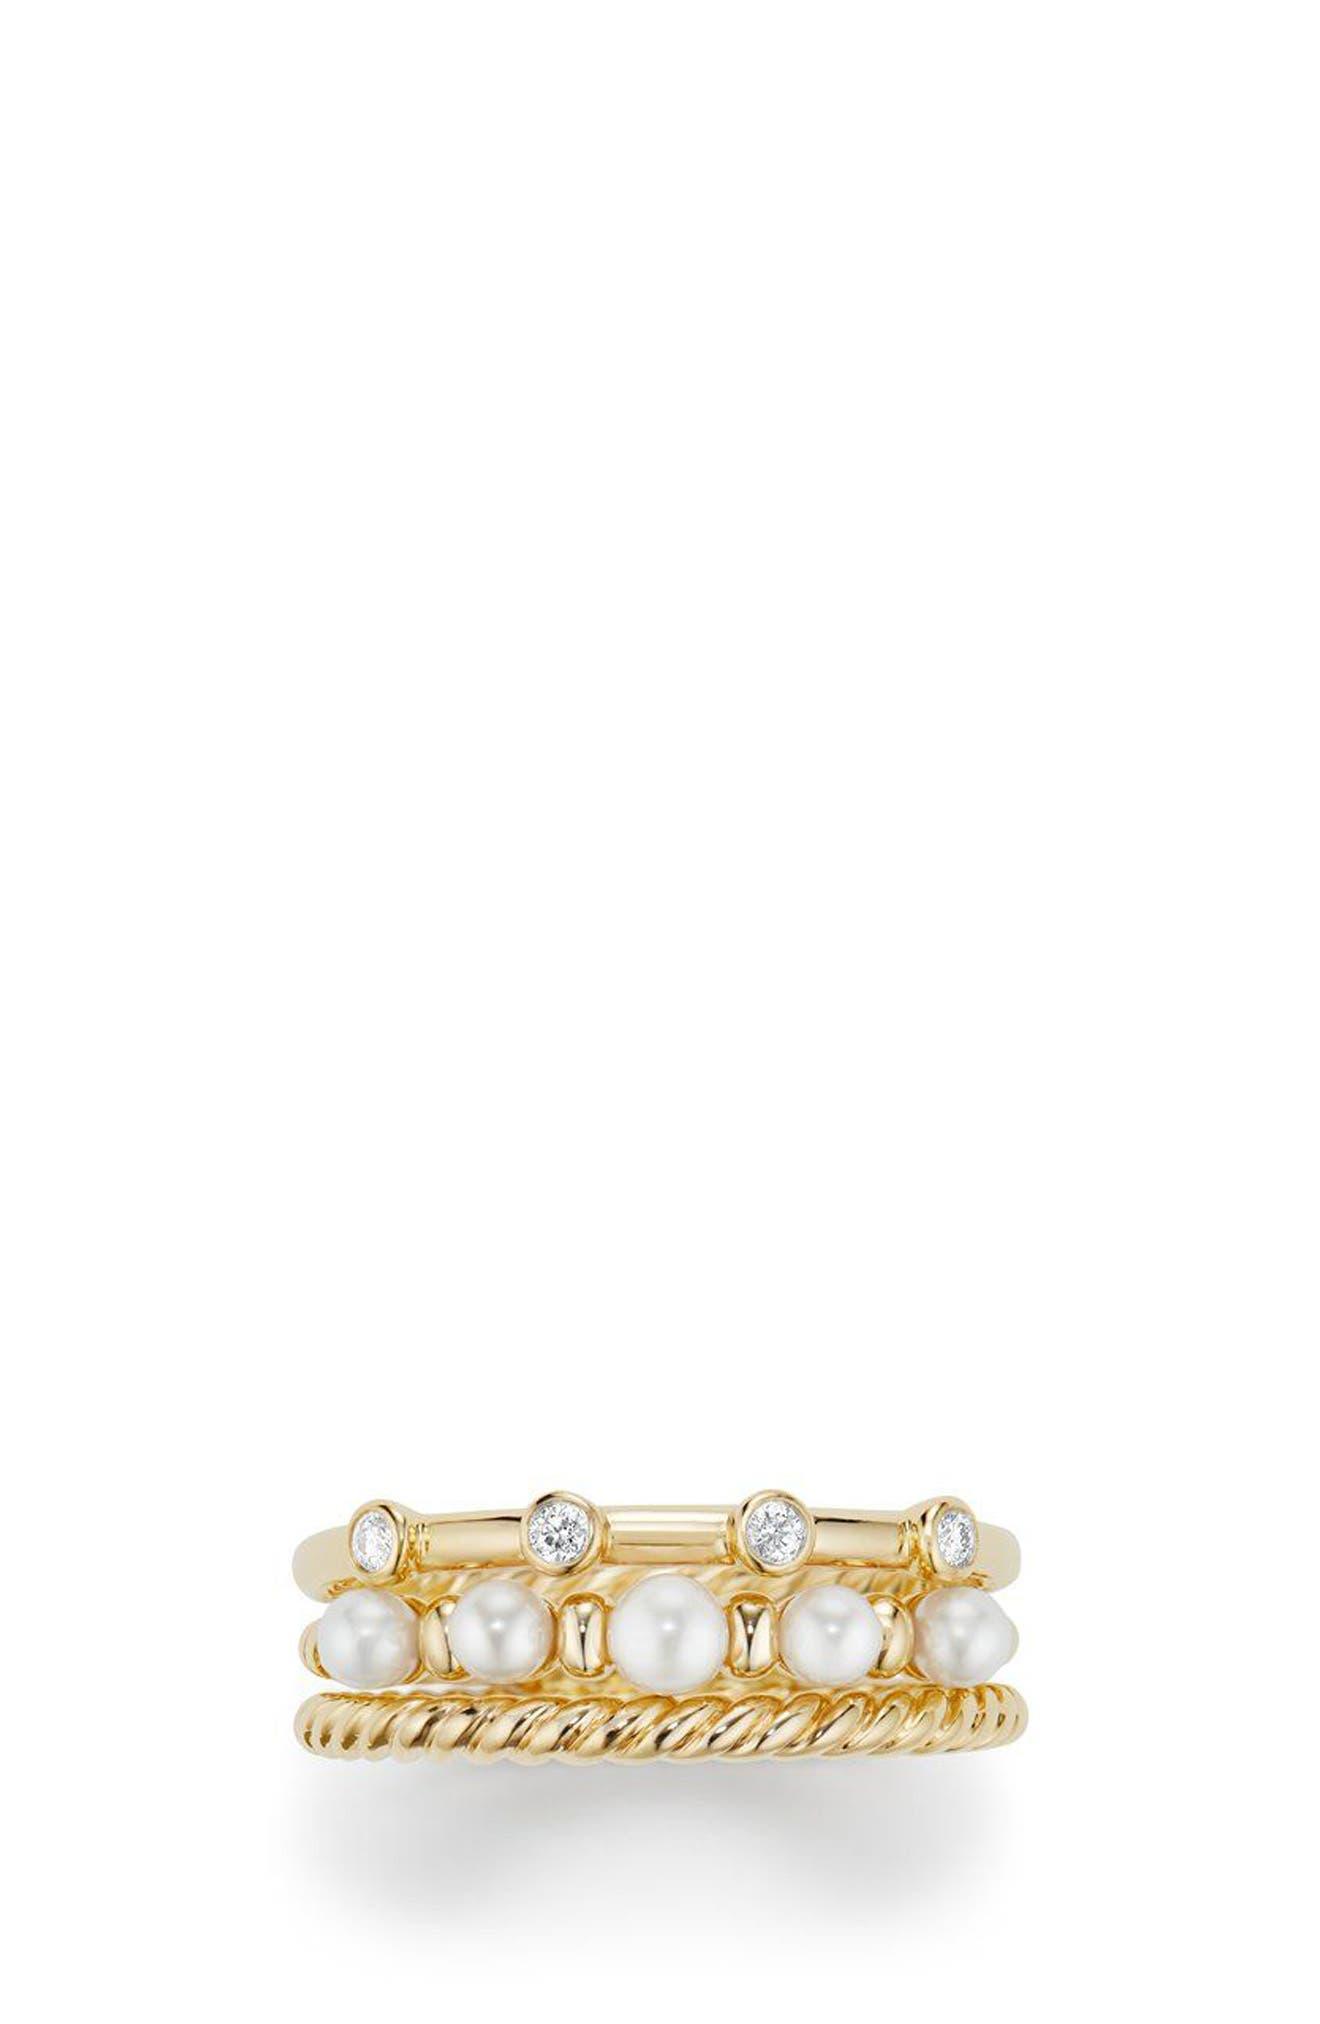 Petite Perle Narrow Multi Row Ring with Pearls and Diamonds,                         Main,                         color, GOLD/ DIAMOND/ PEARL